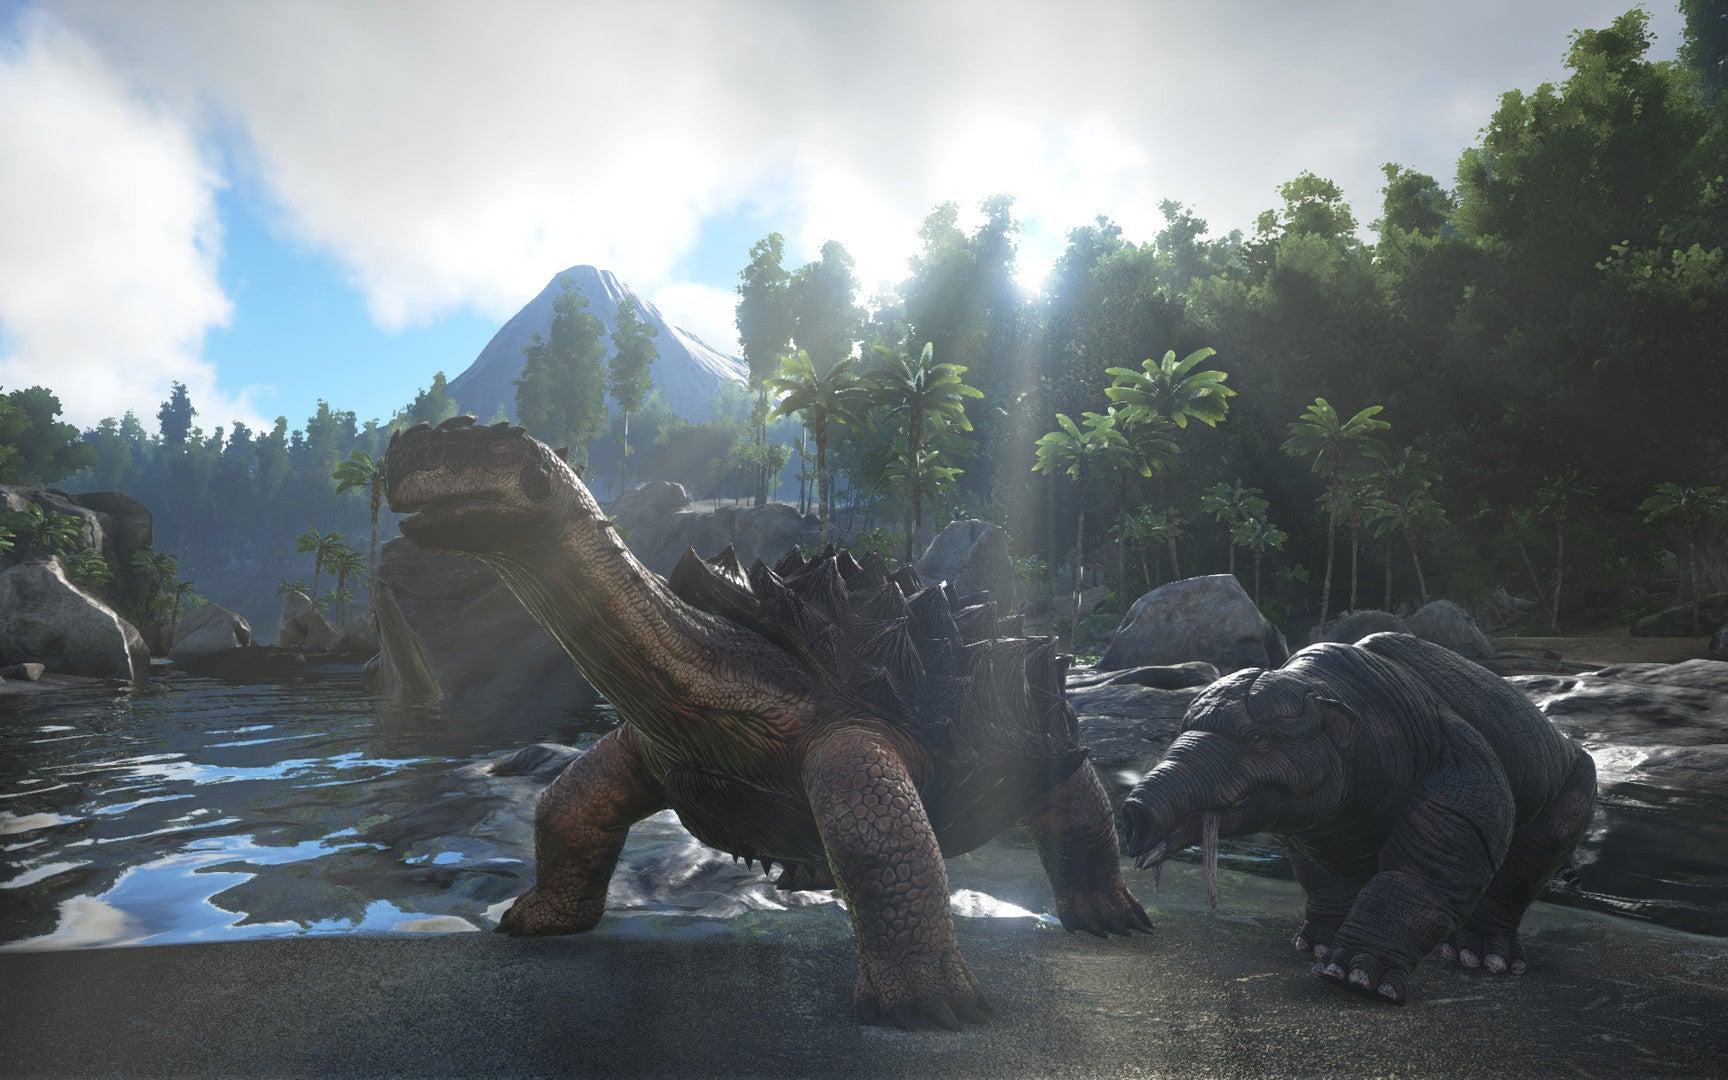 Game Studios Enter Legal Battle Over The Making Of Ark: Survival Evolved